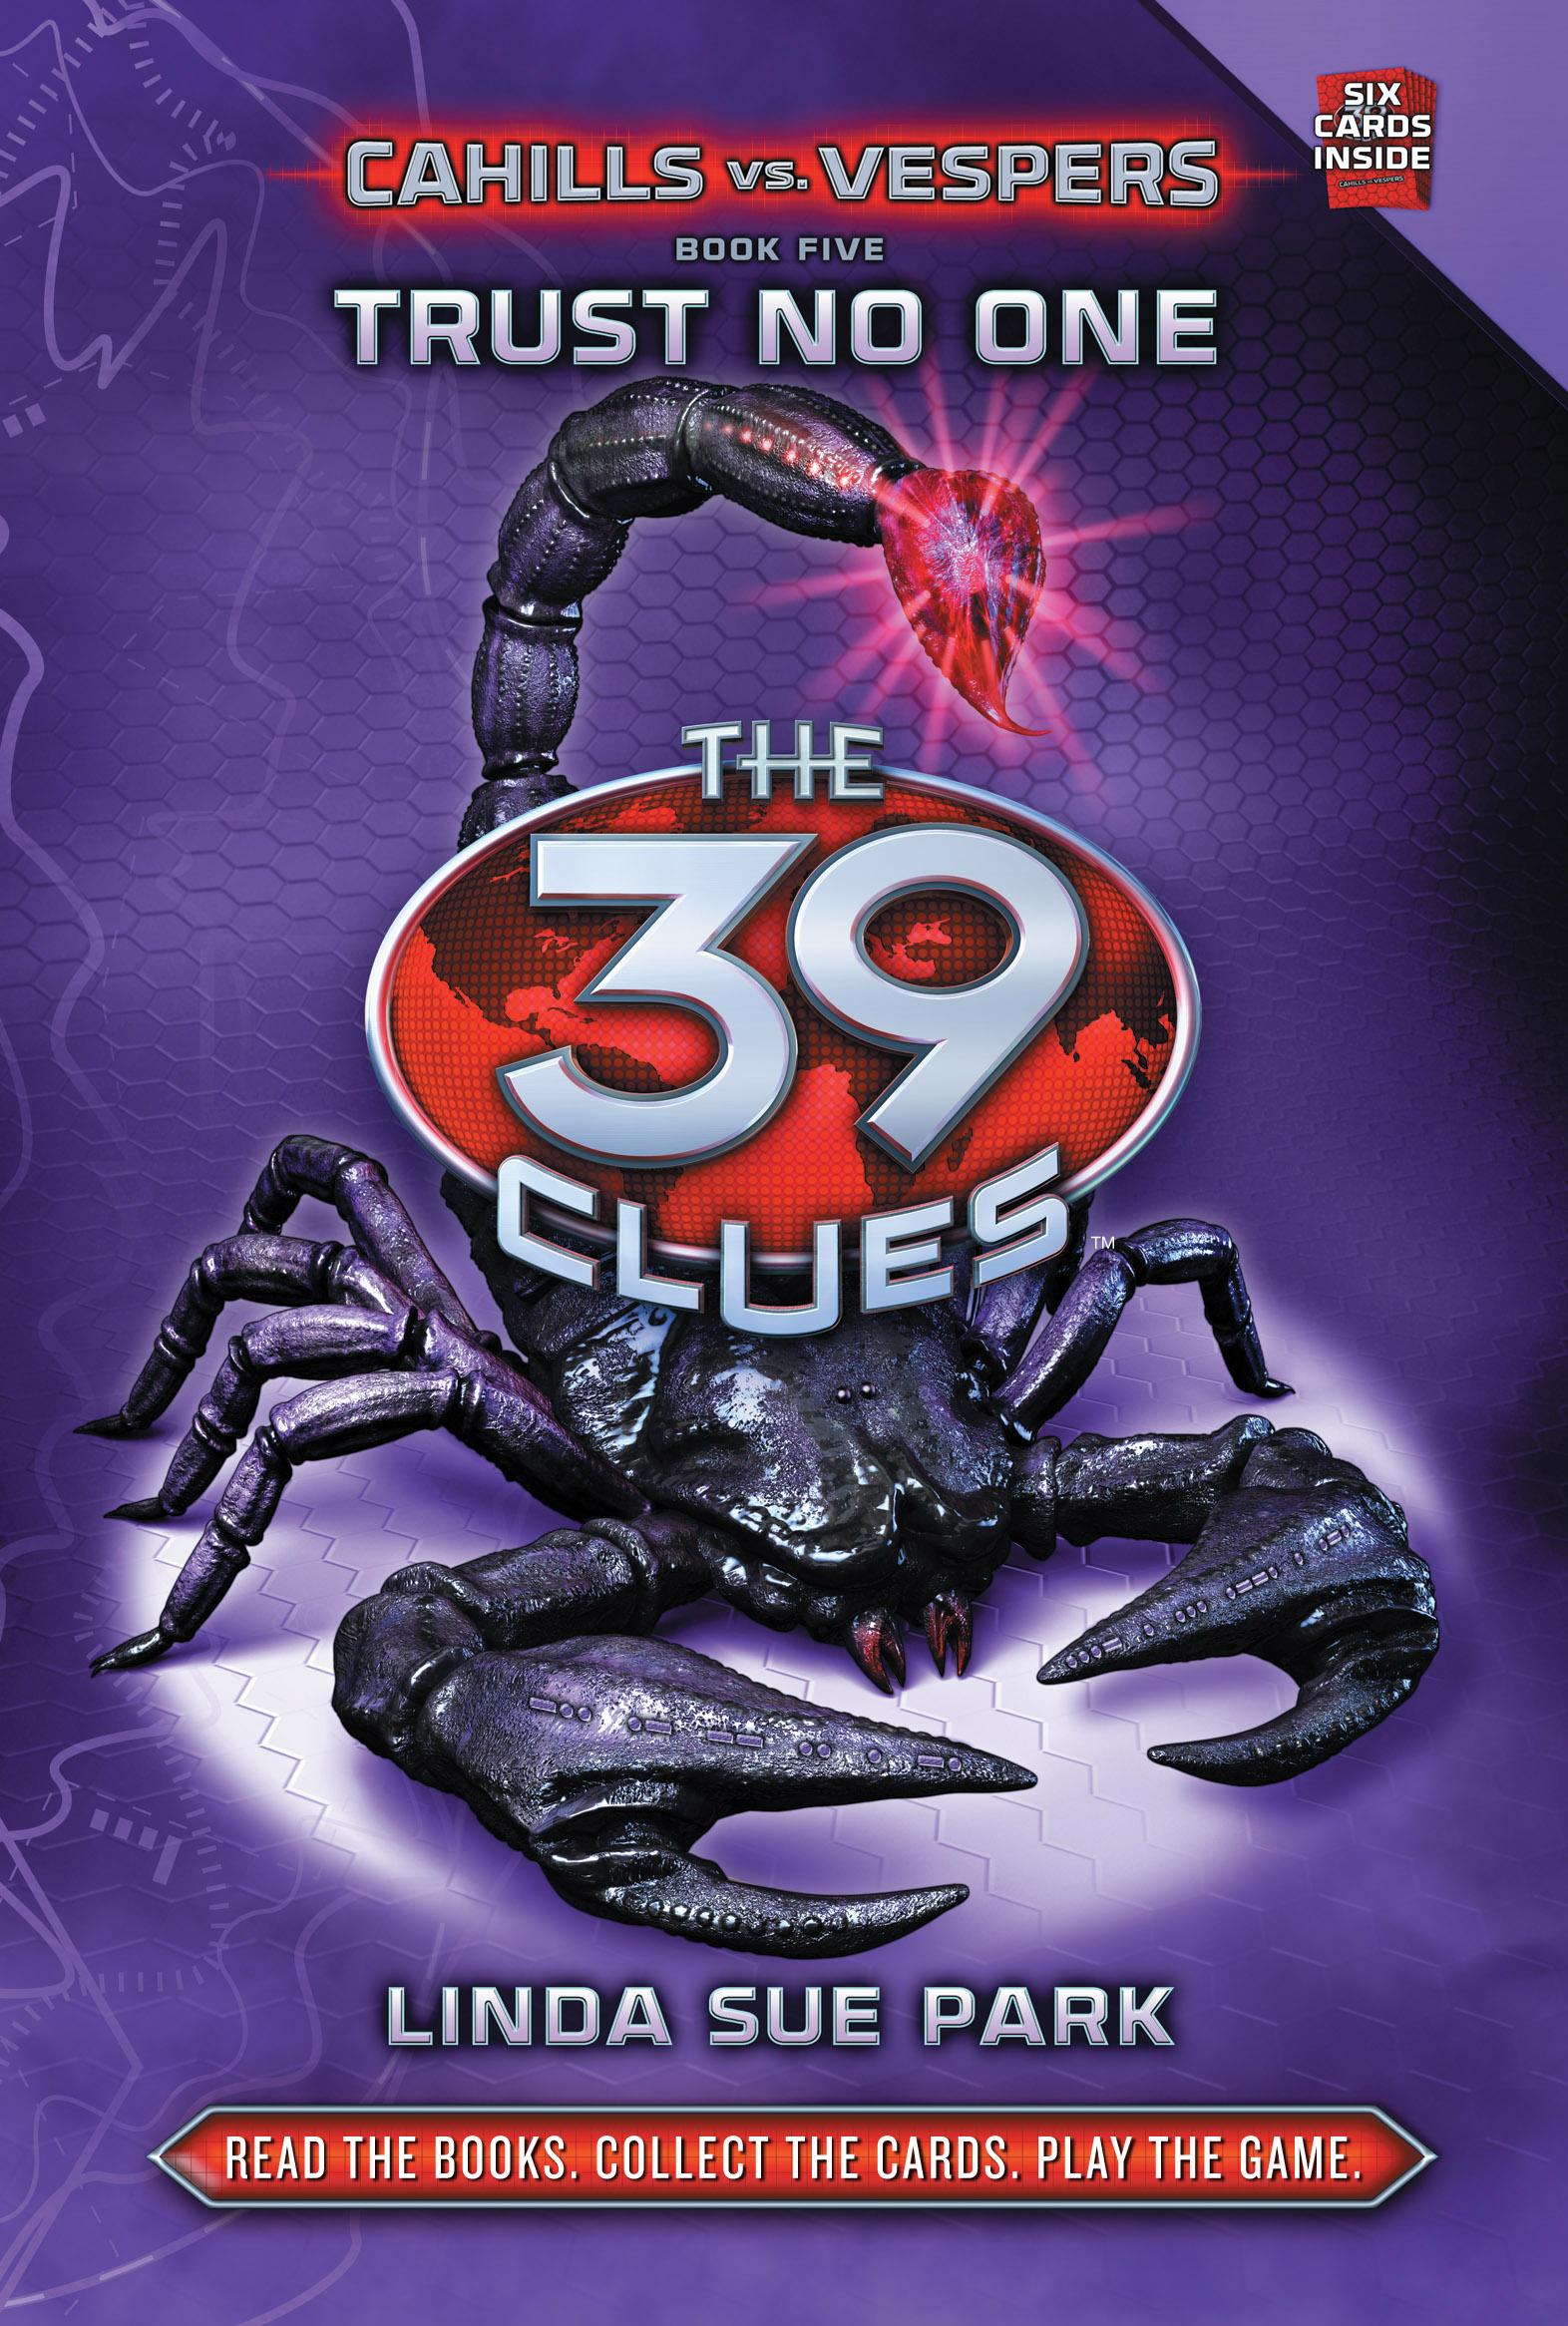 The 39 Clues: Cahills Vs Vespers Book 5: Trust No One Flat Cover